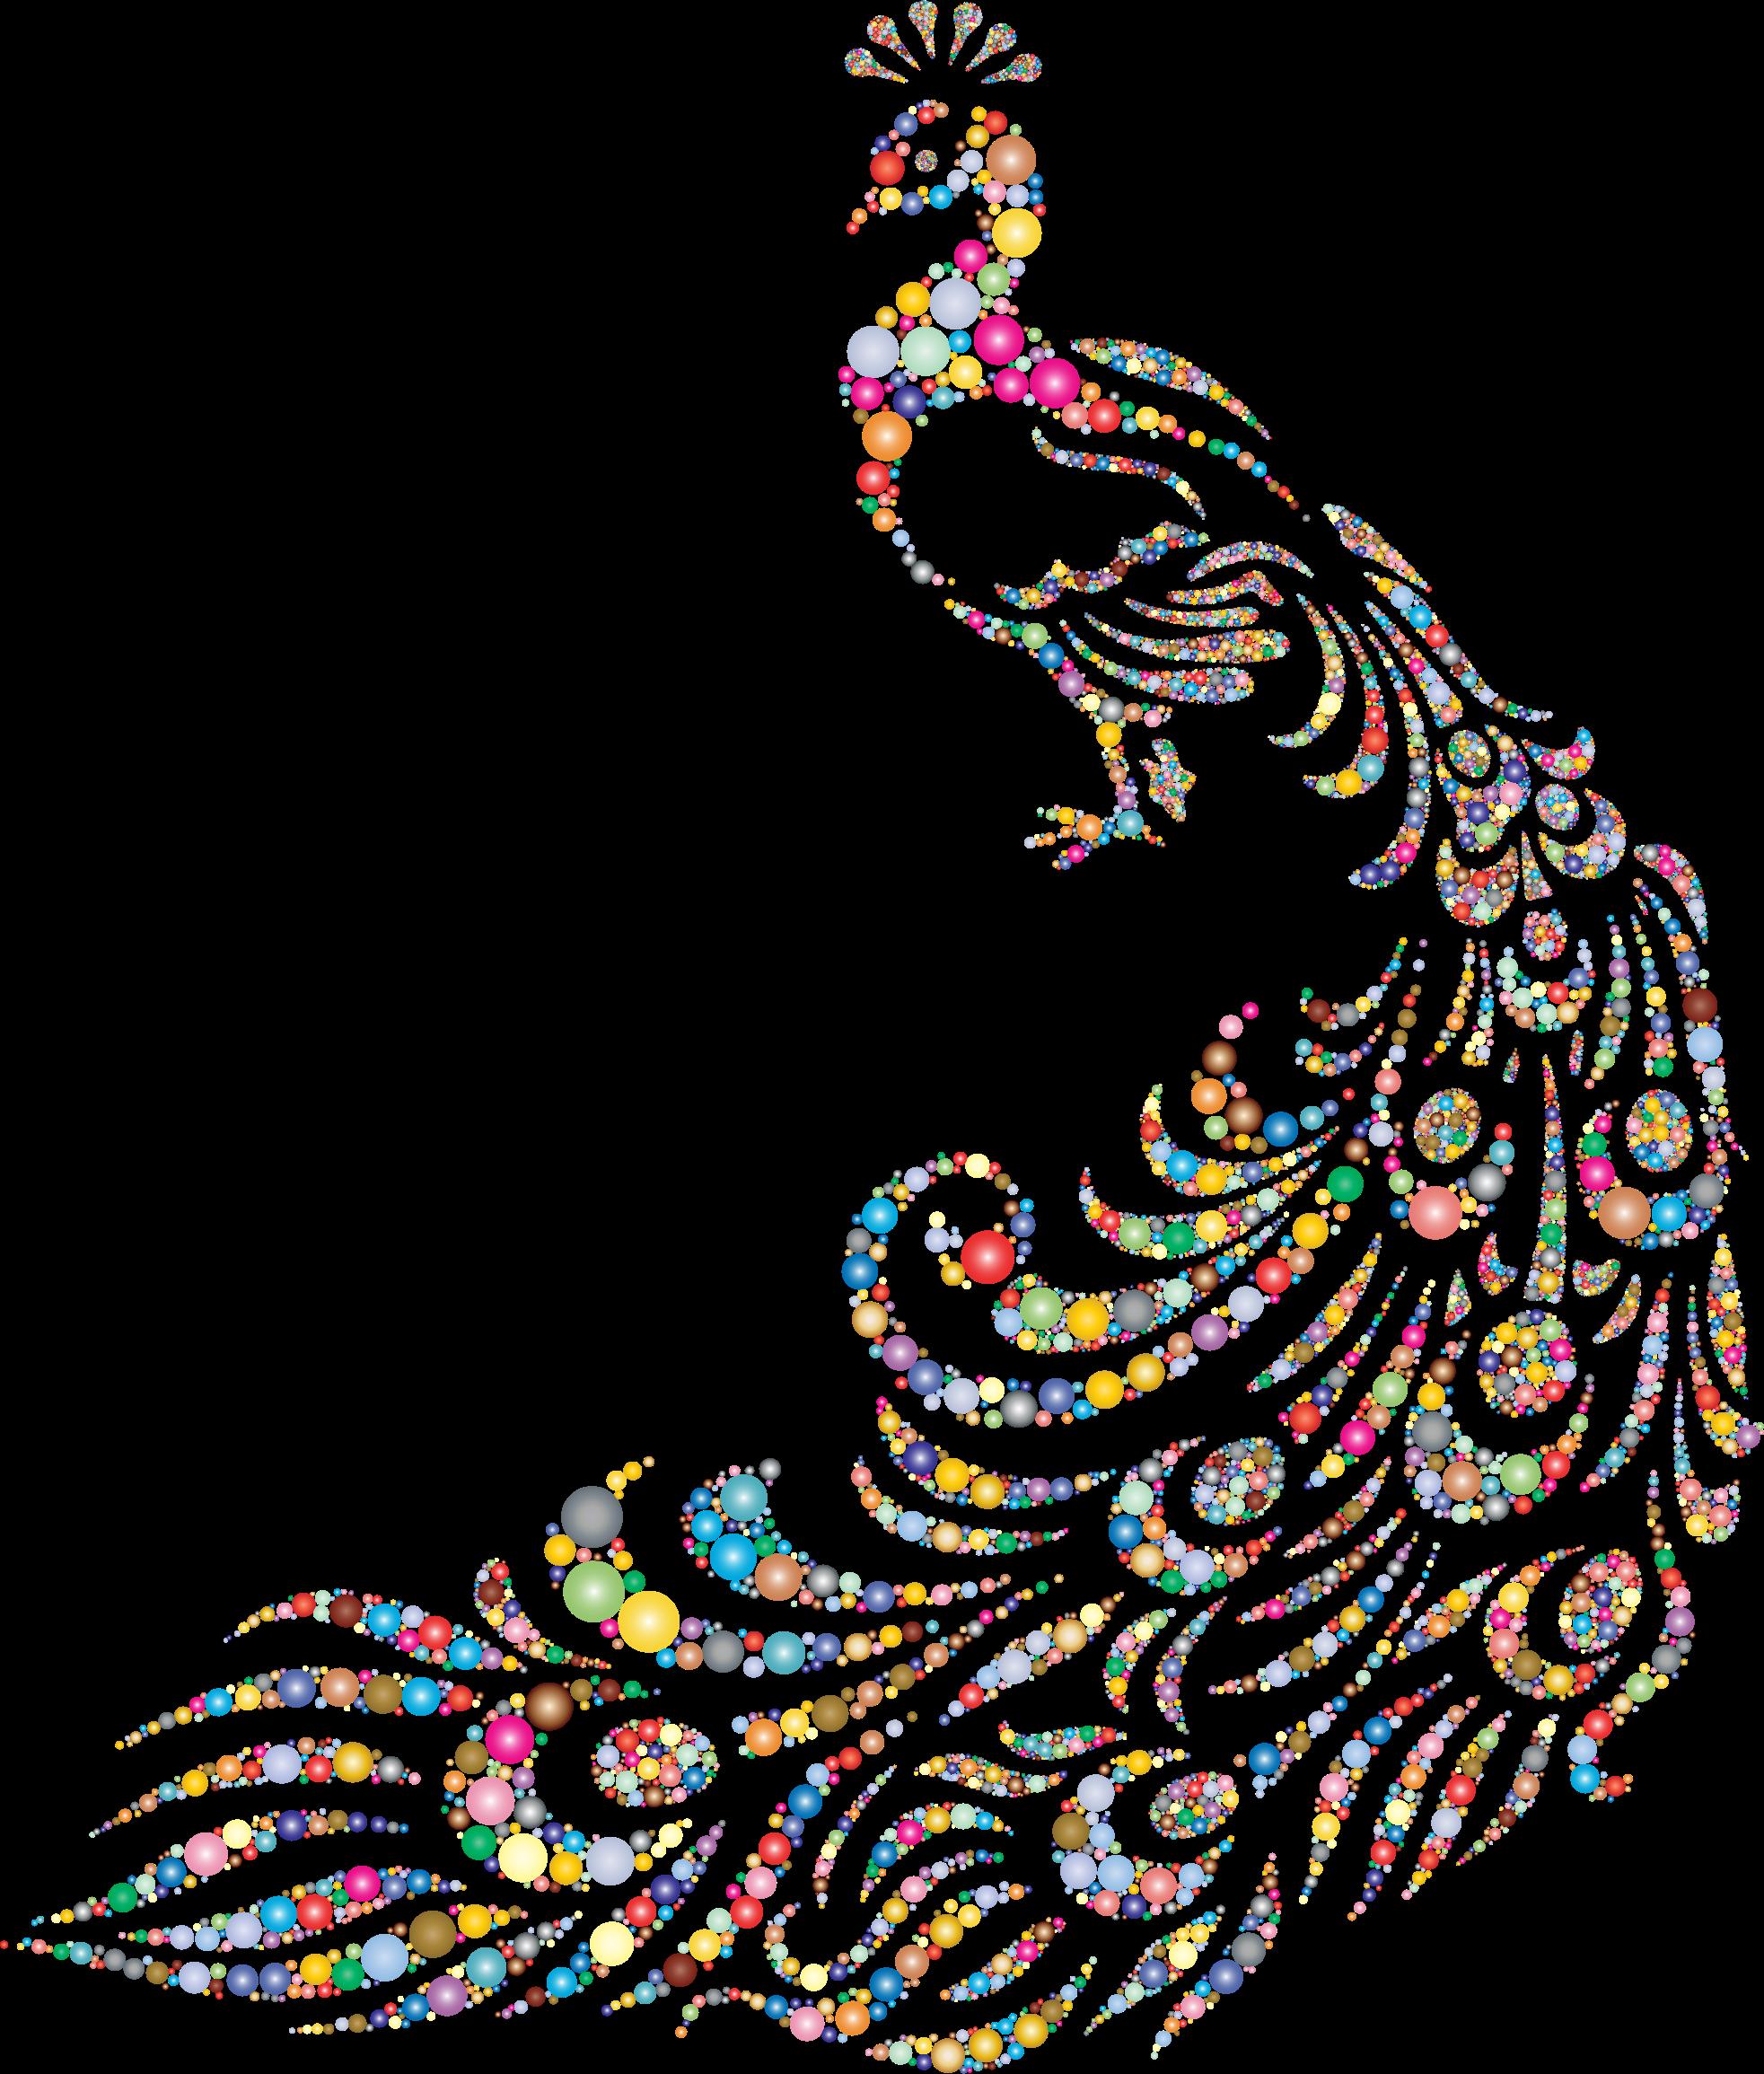 peacock clipart colourful peacock